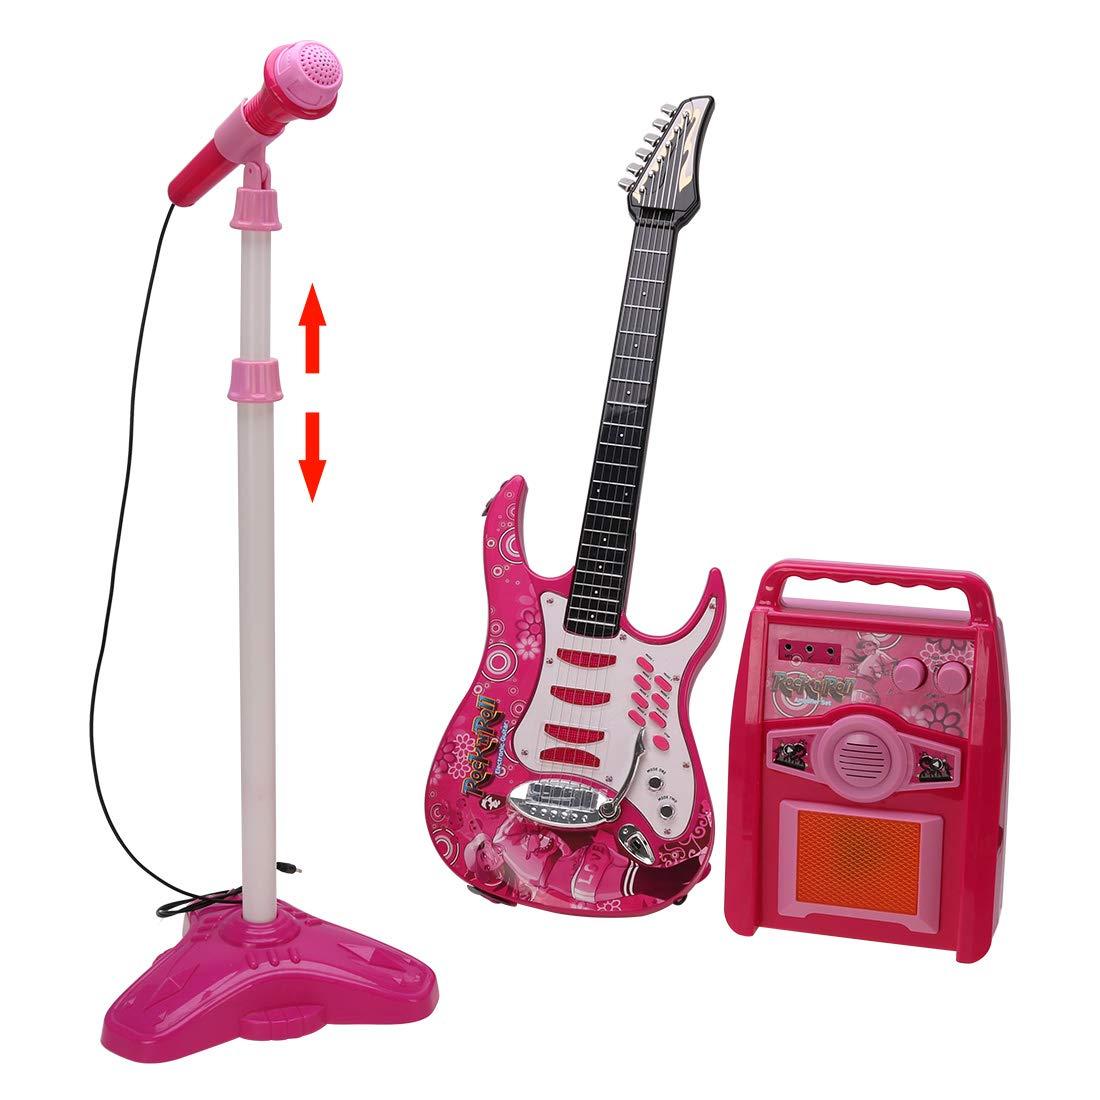 PeleusTech® Children's Karaoke Set, Electronic Guitar + Loudspeaker Box + Microphone Stand Gift for Kids